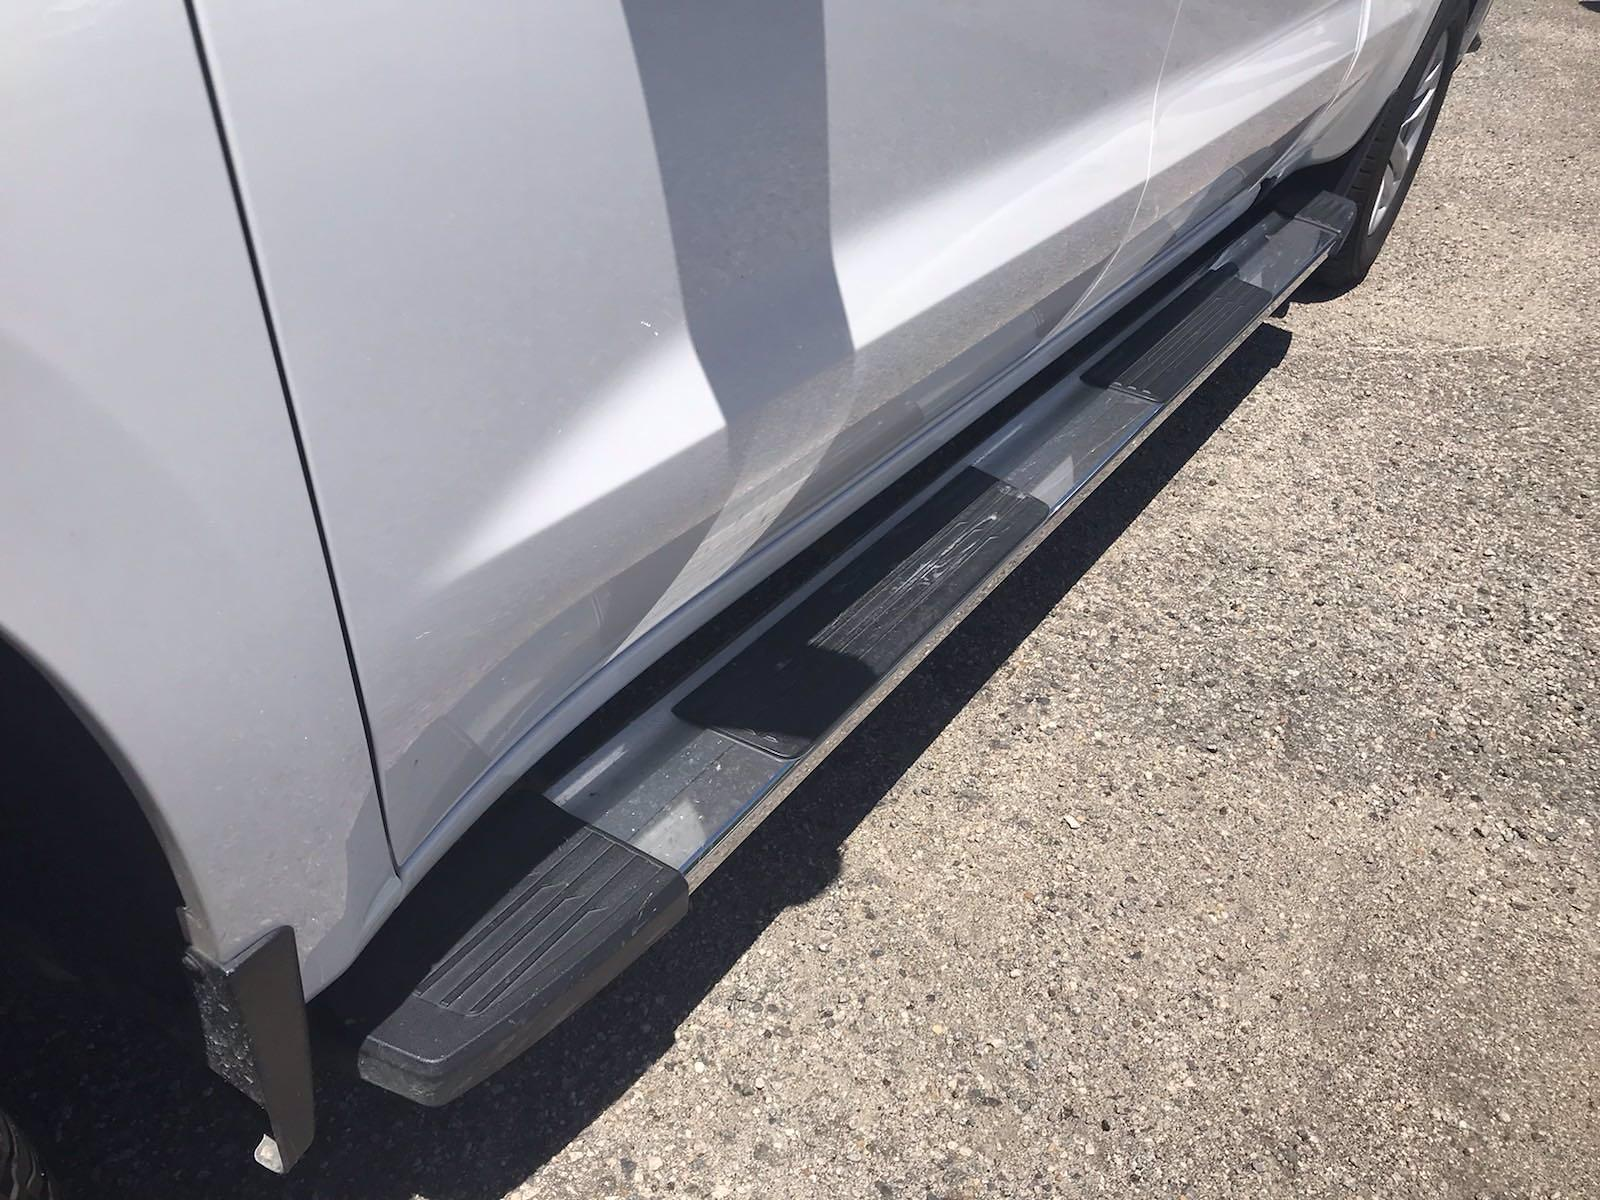 2019 Chevrolet Silverado 1500 Crew Cab 4x4, Pickup #16575P - photo 14